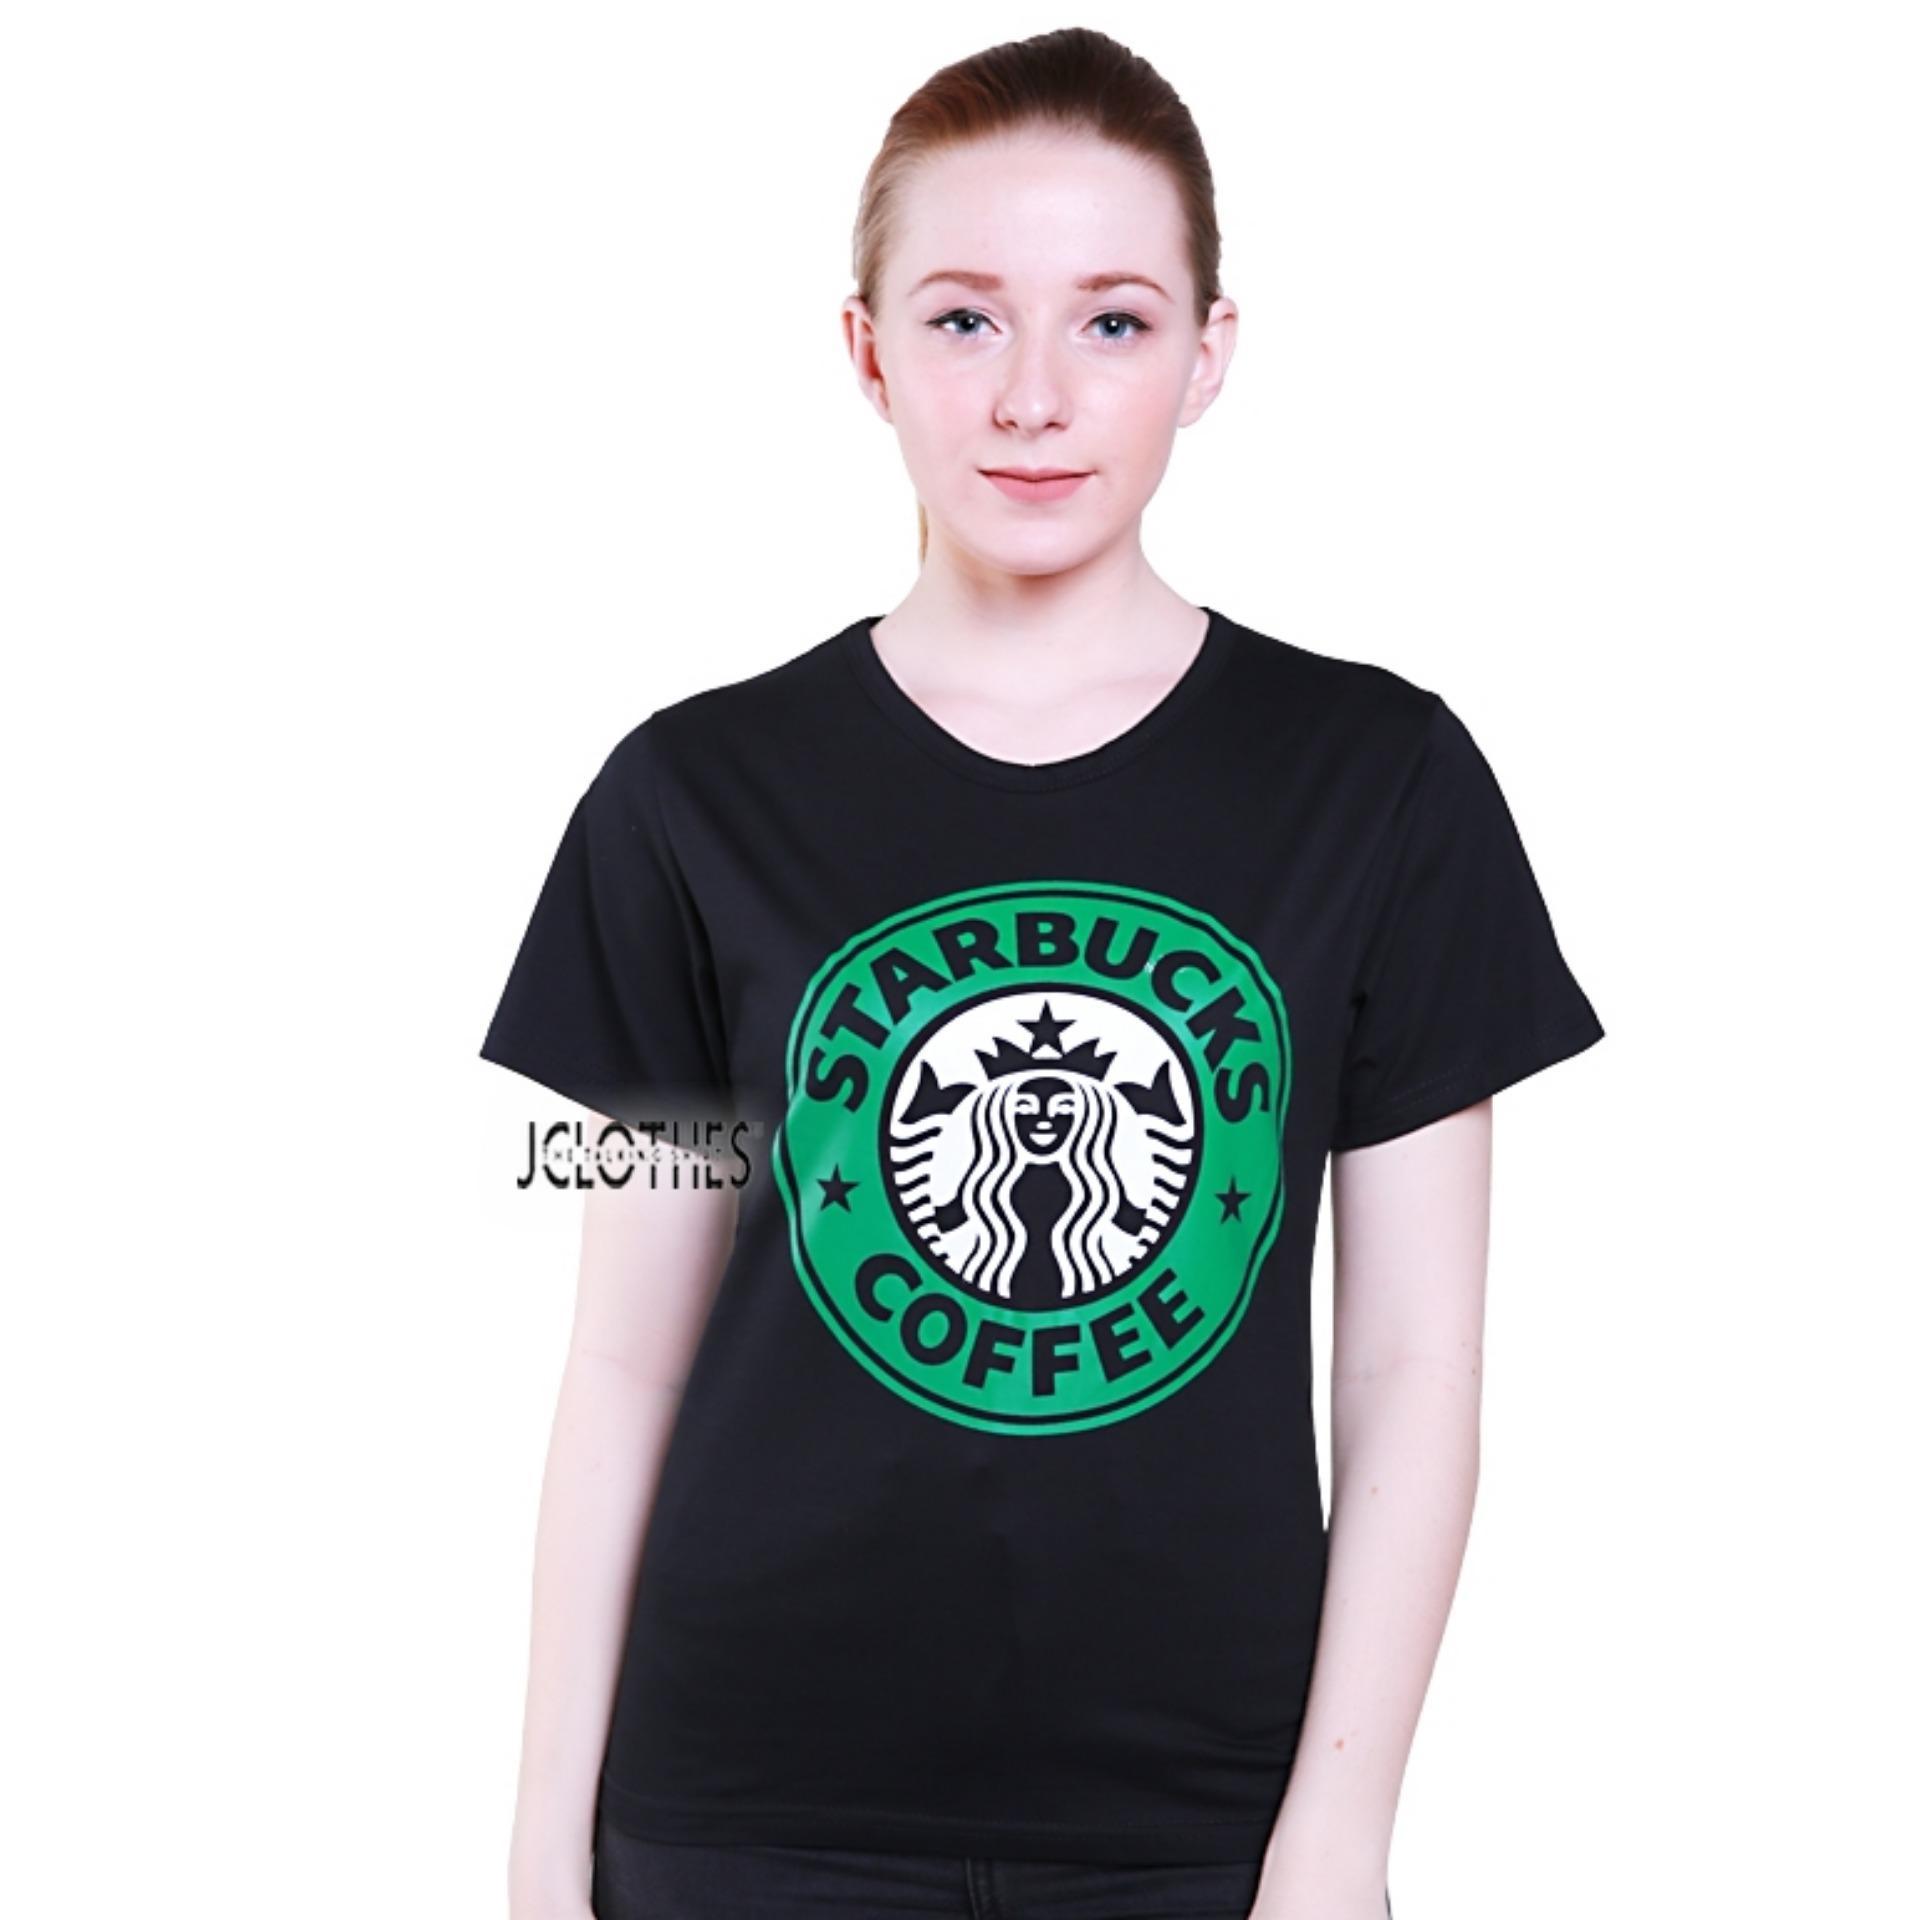 Tumblr Tee / Kaos Wanita / Kaos Branded / Kaos Cewek Starbuck